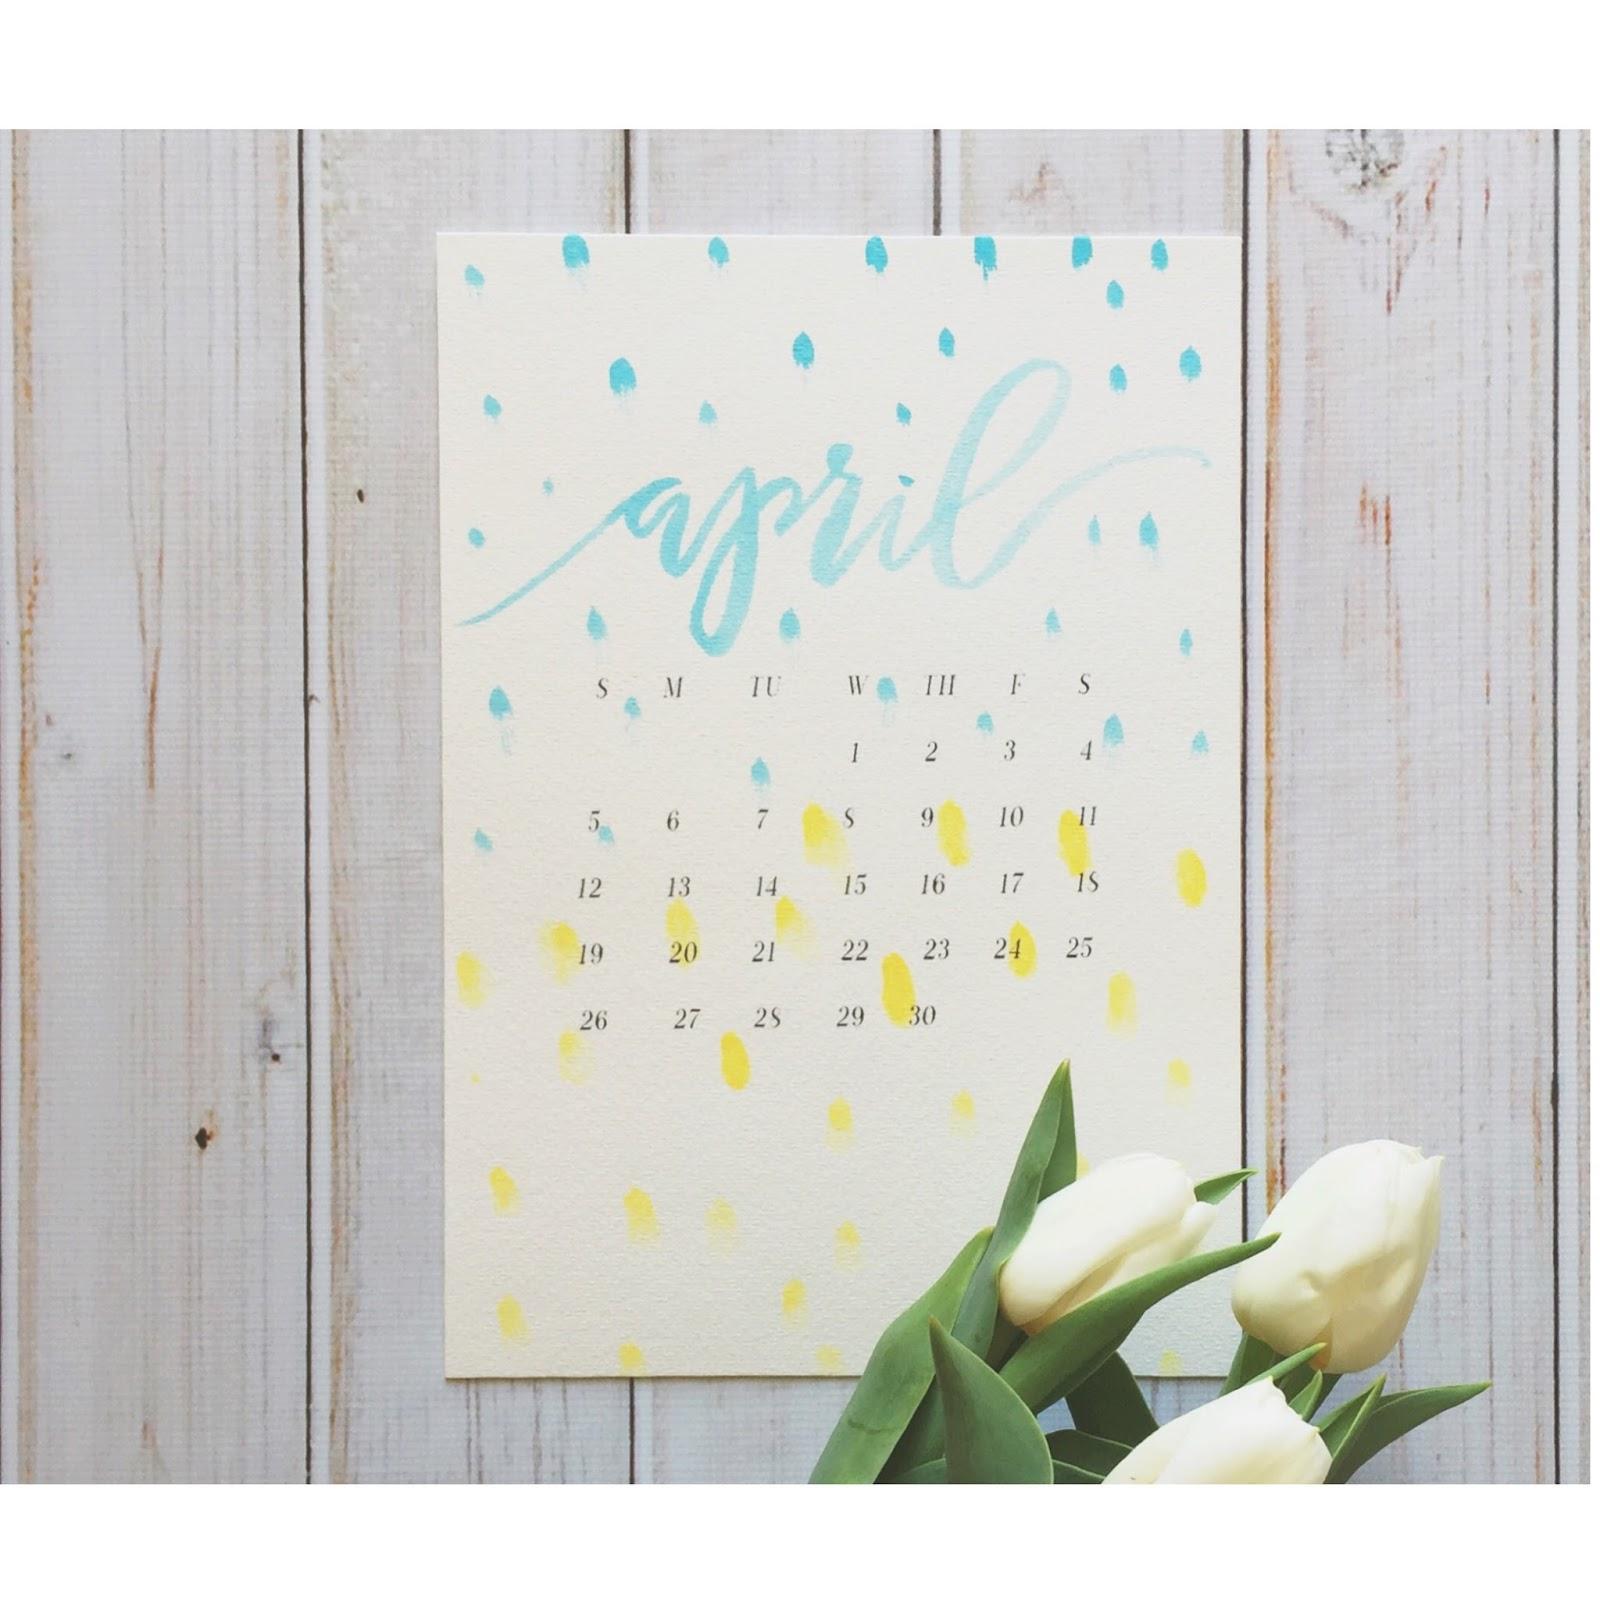 she makes stuff april 2015 desktop calendar wallpaper 1600x1600